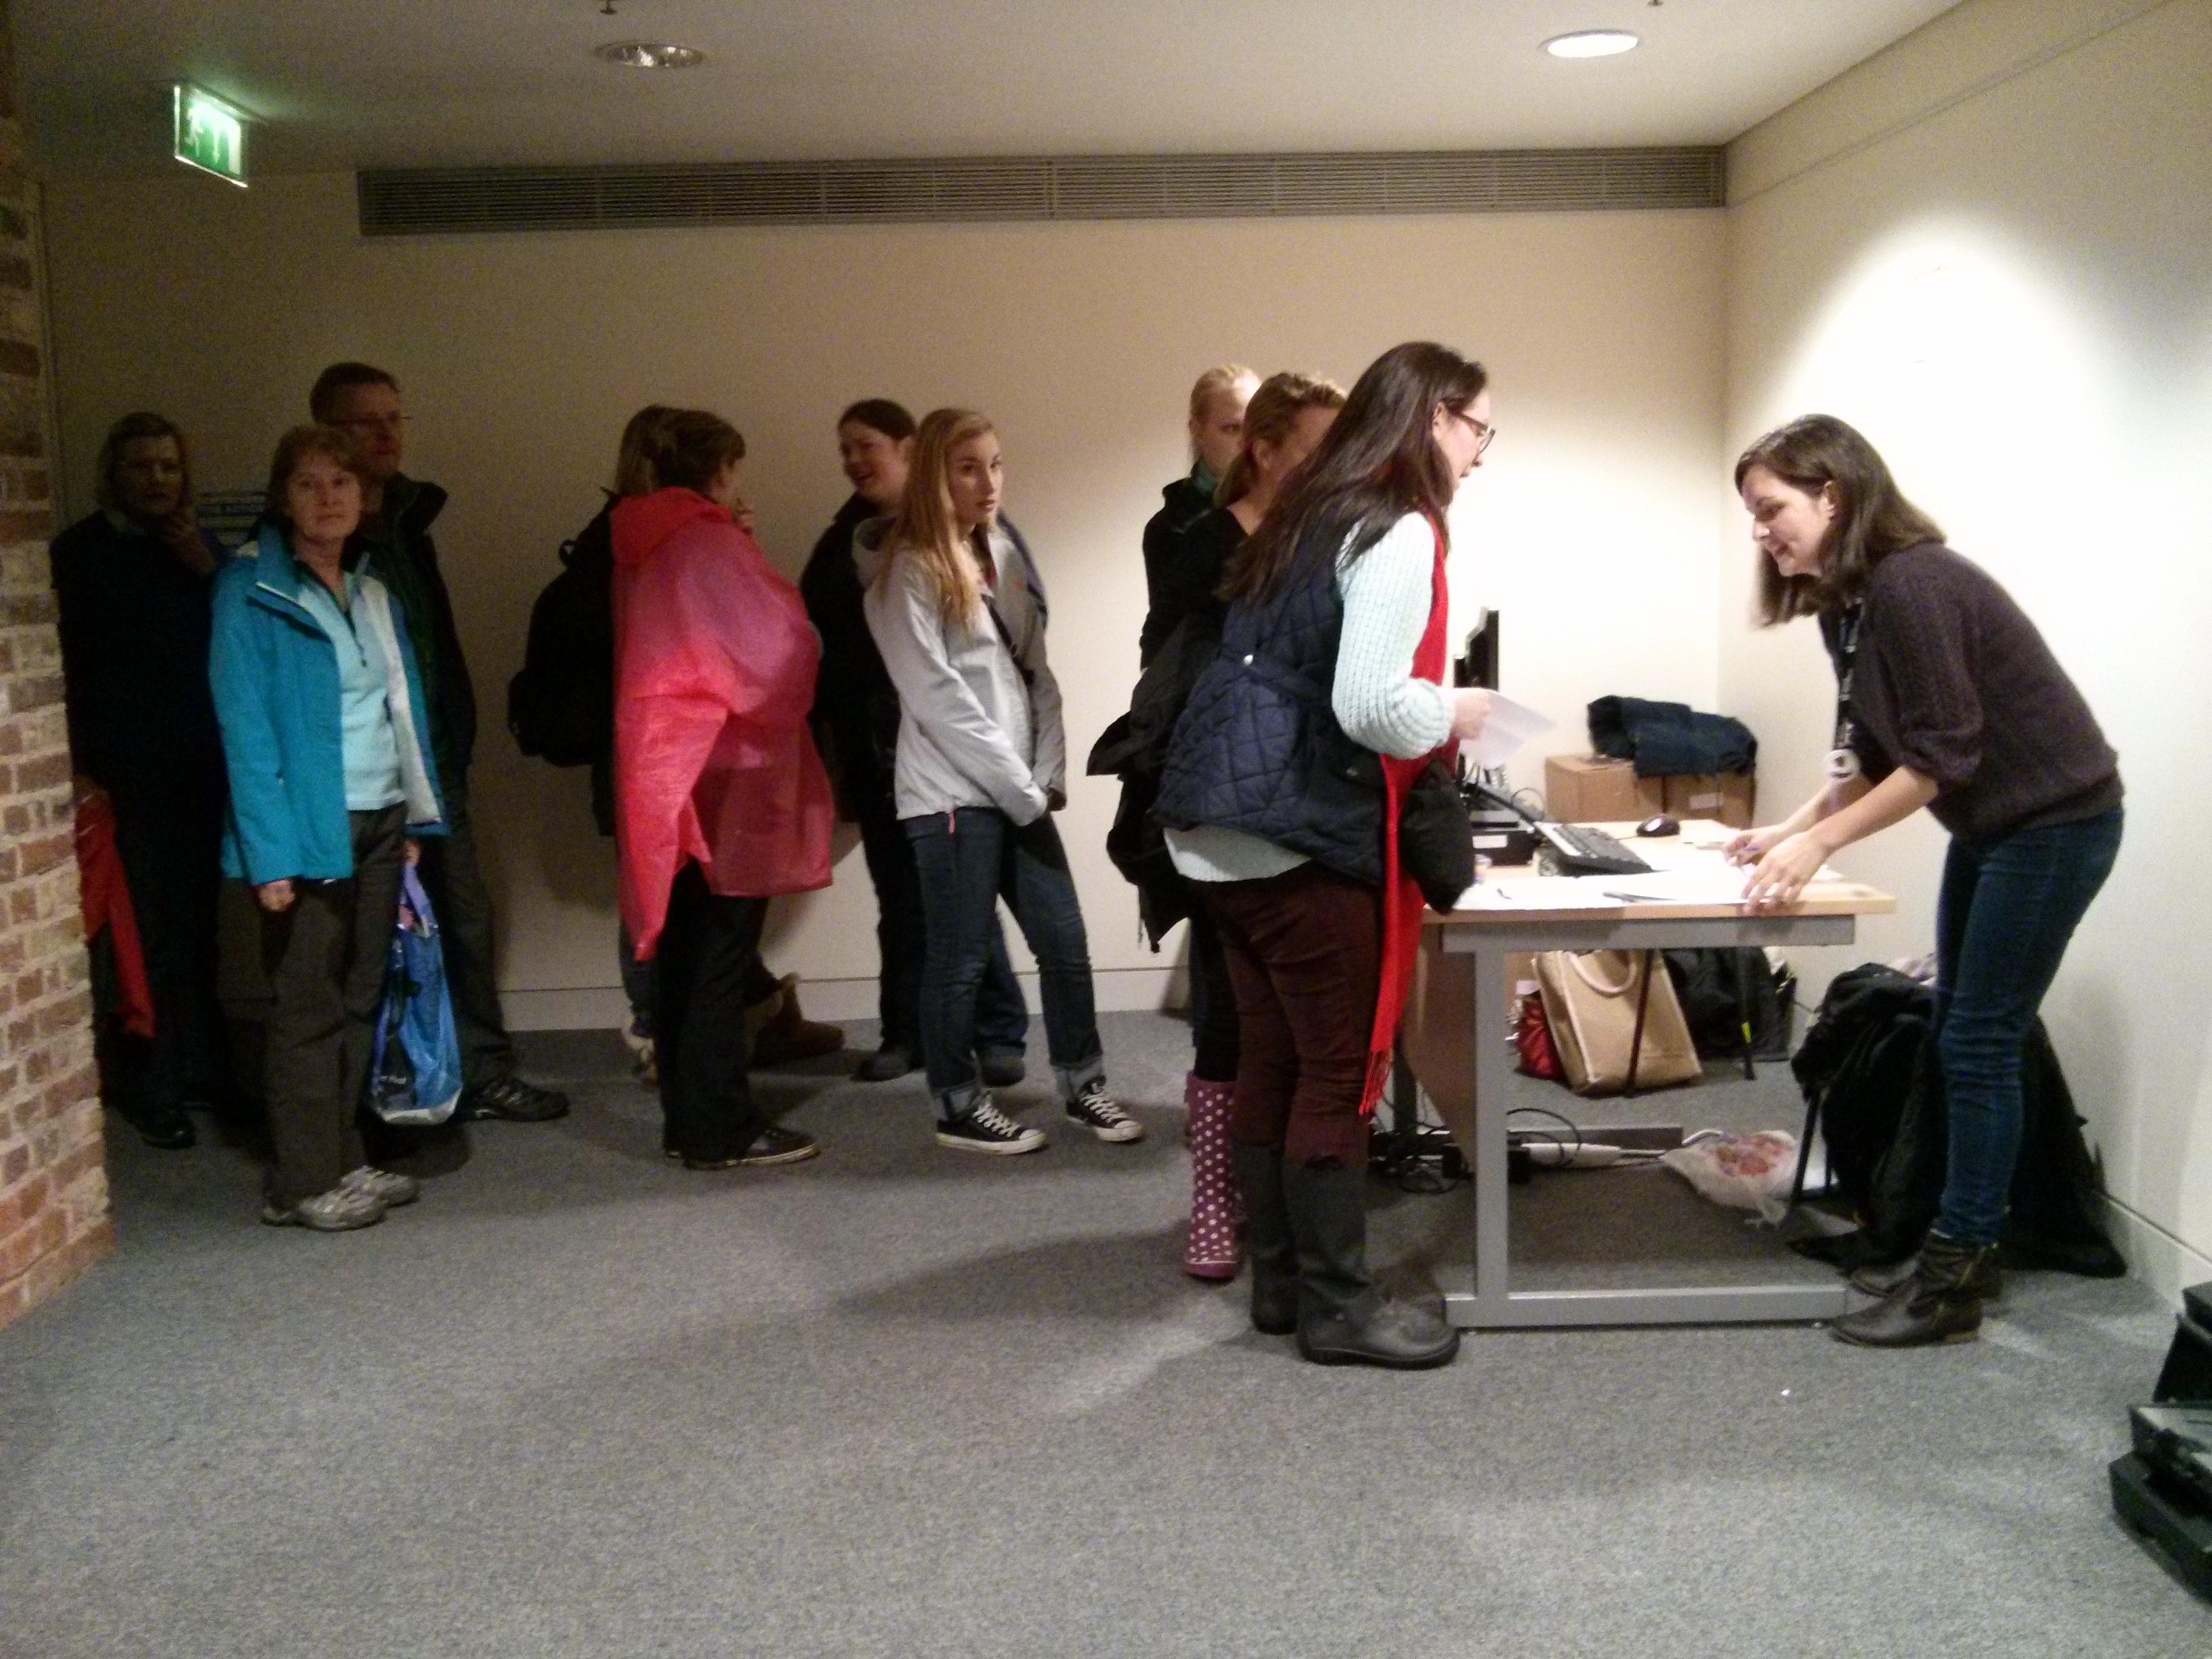 Tower poppies volunteering registration queue